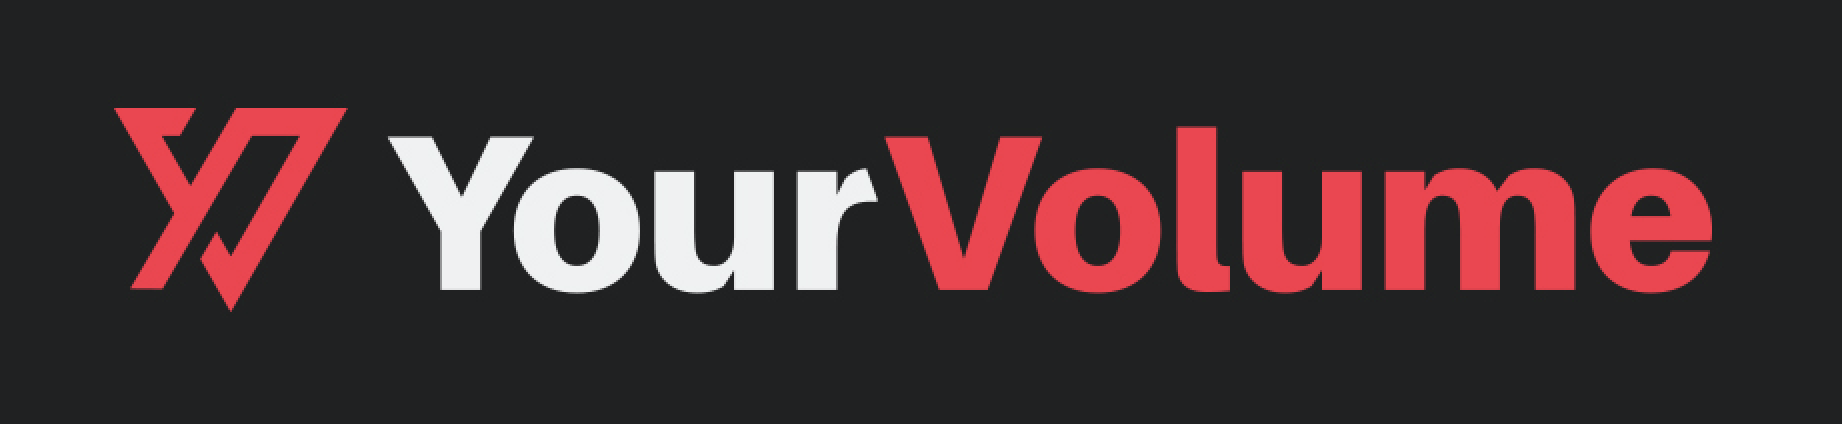 YourVolume